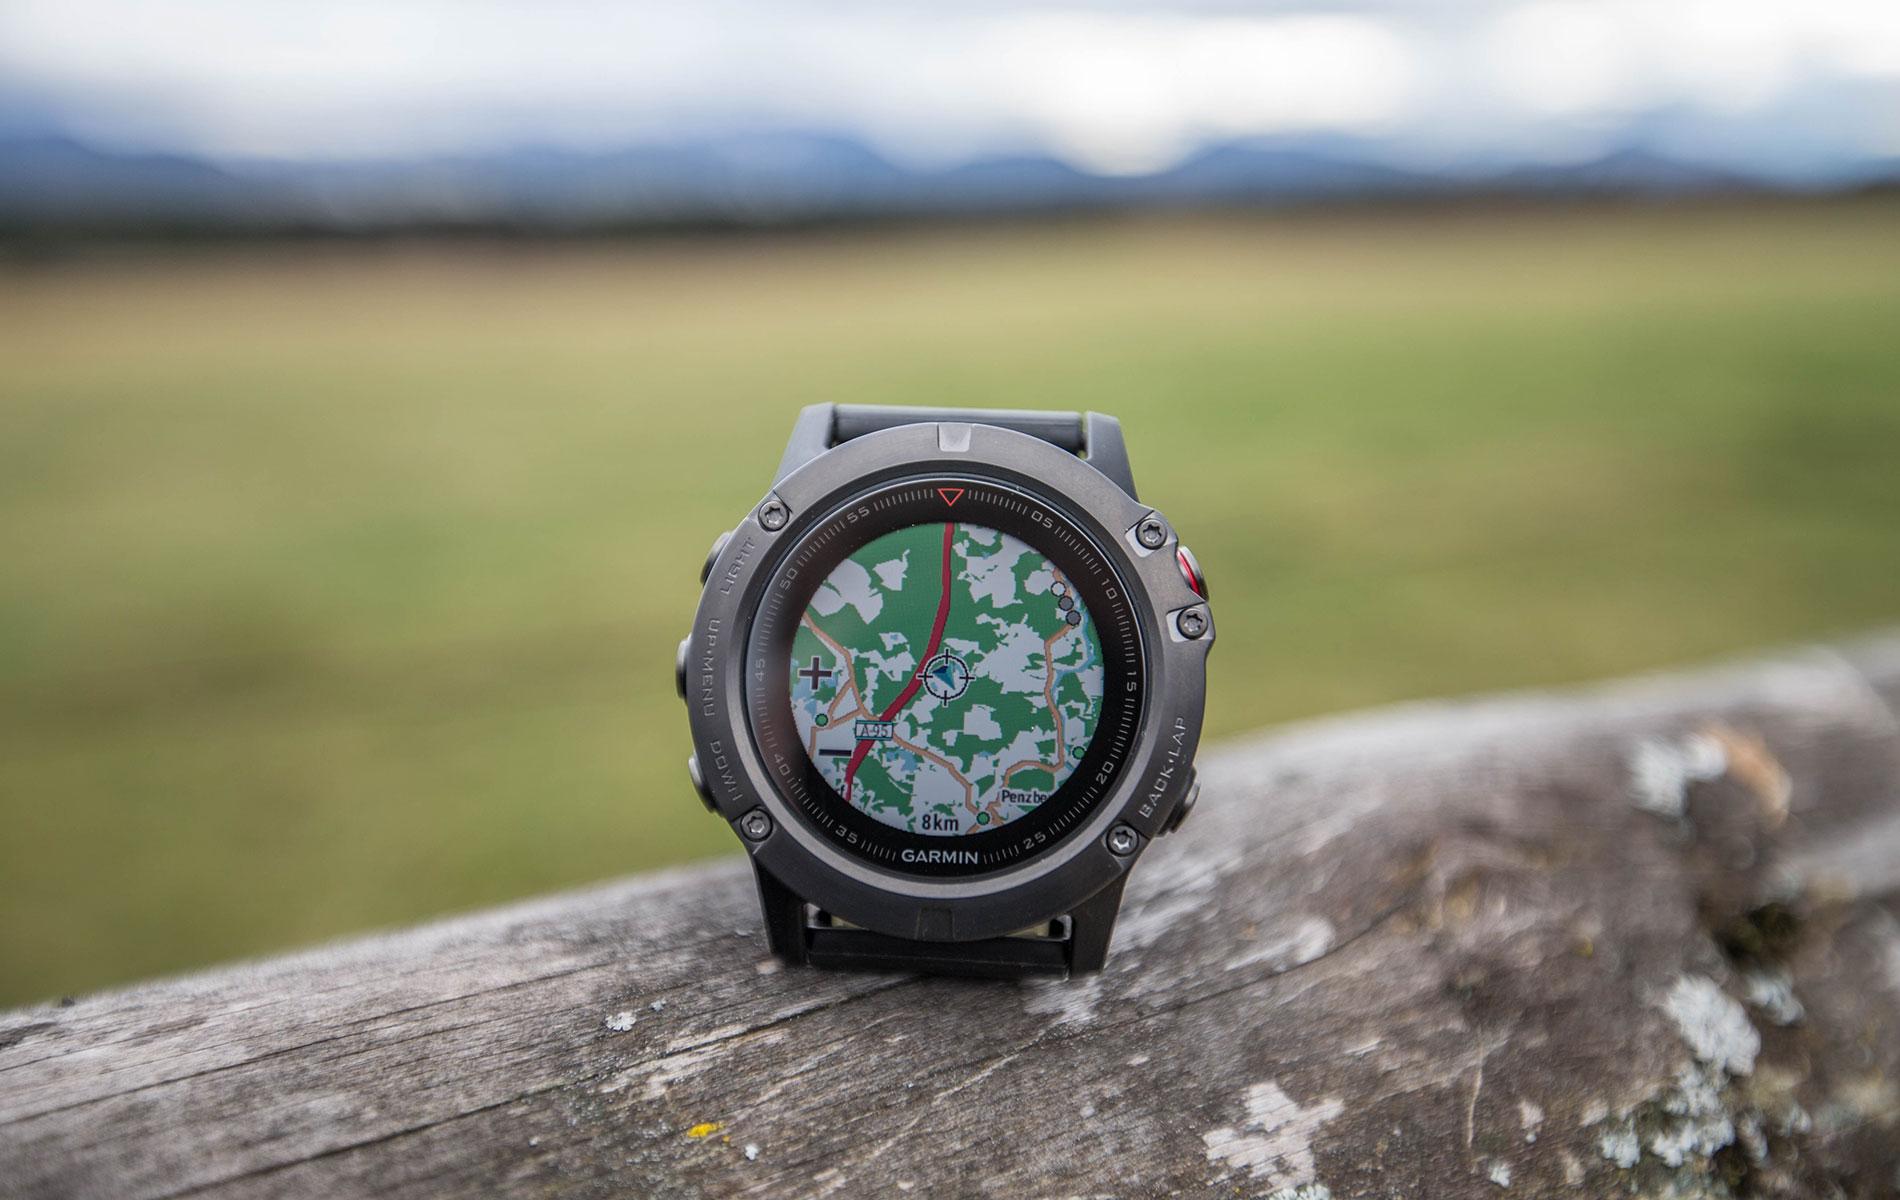 garmin fenix 5 neue gps multisport smartwatch mit. Black Bedroom Furniture Sets. Home Design Ideas